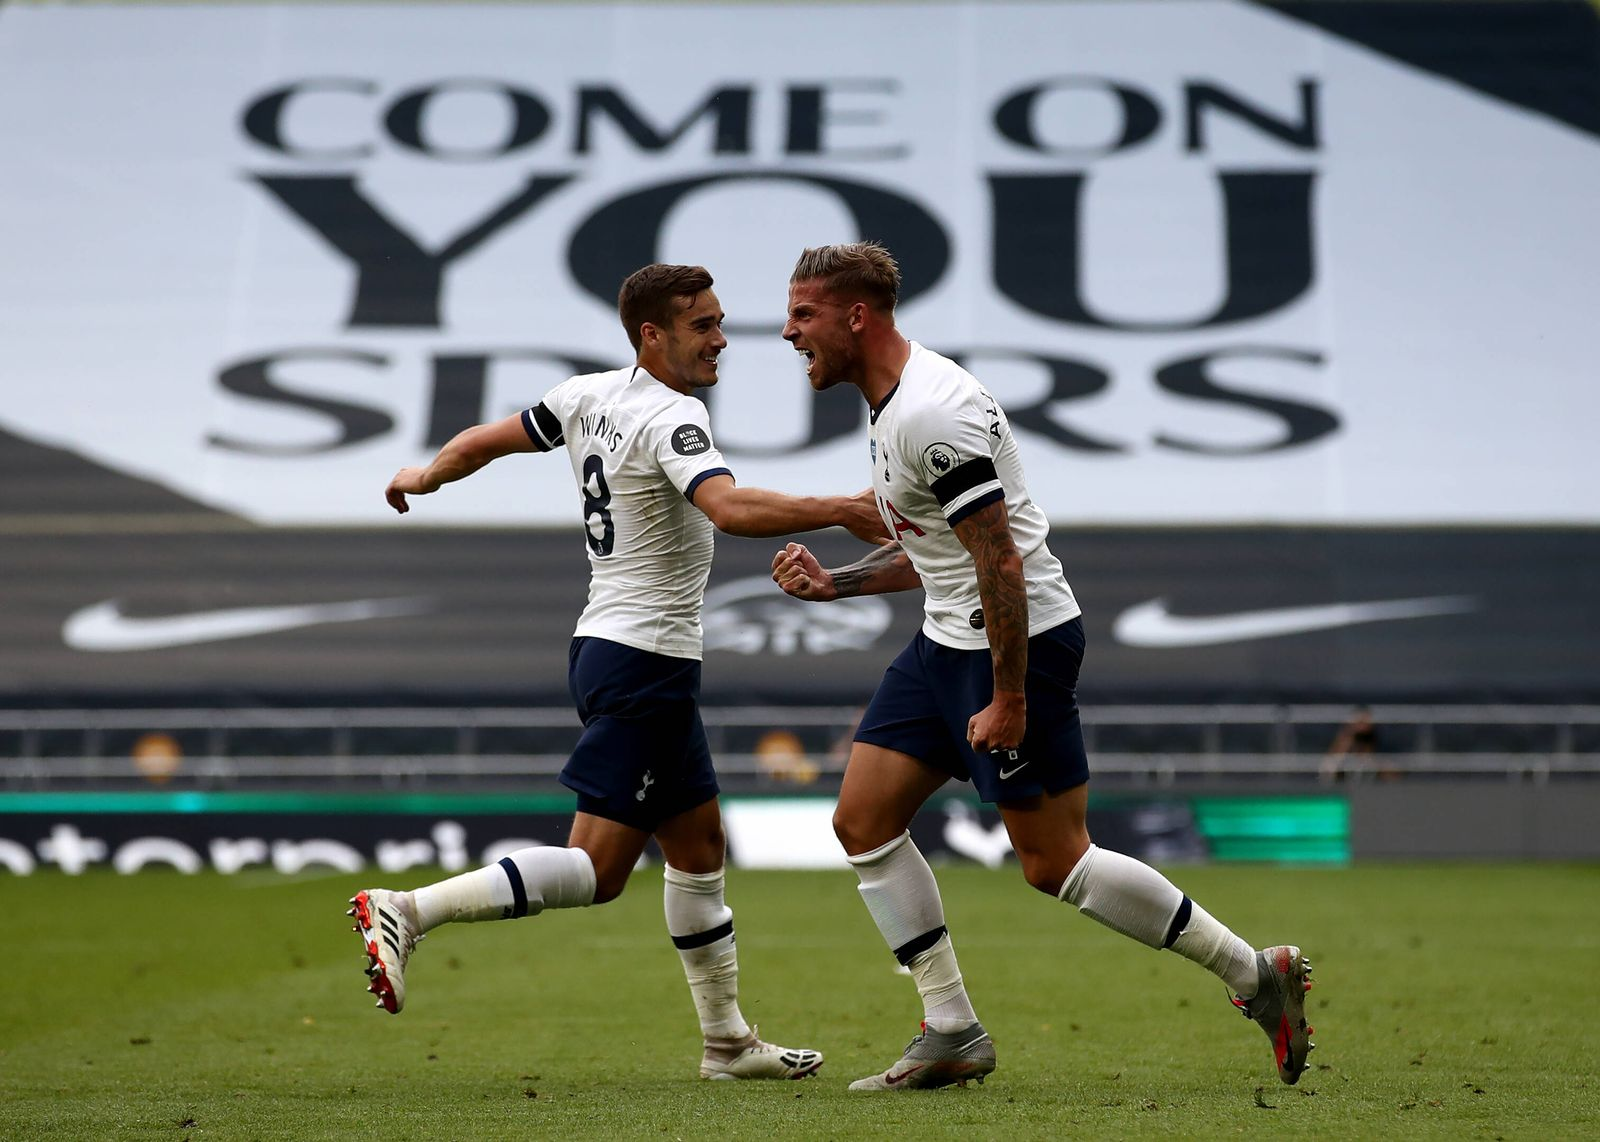 Tottenham Hotspur v Arsenal - Premier League - Tottenham Hotspur Stadium Tottenham Hotspur s Toby Alderweireld (right)